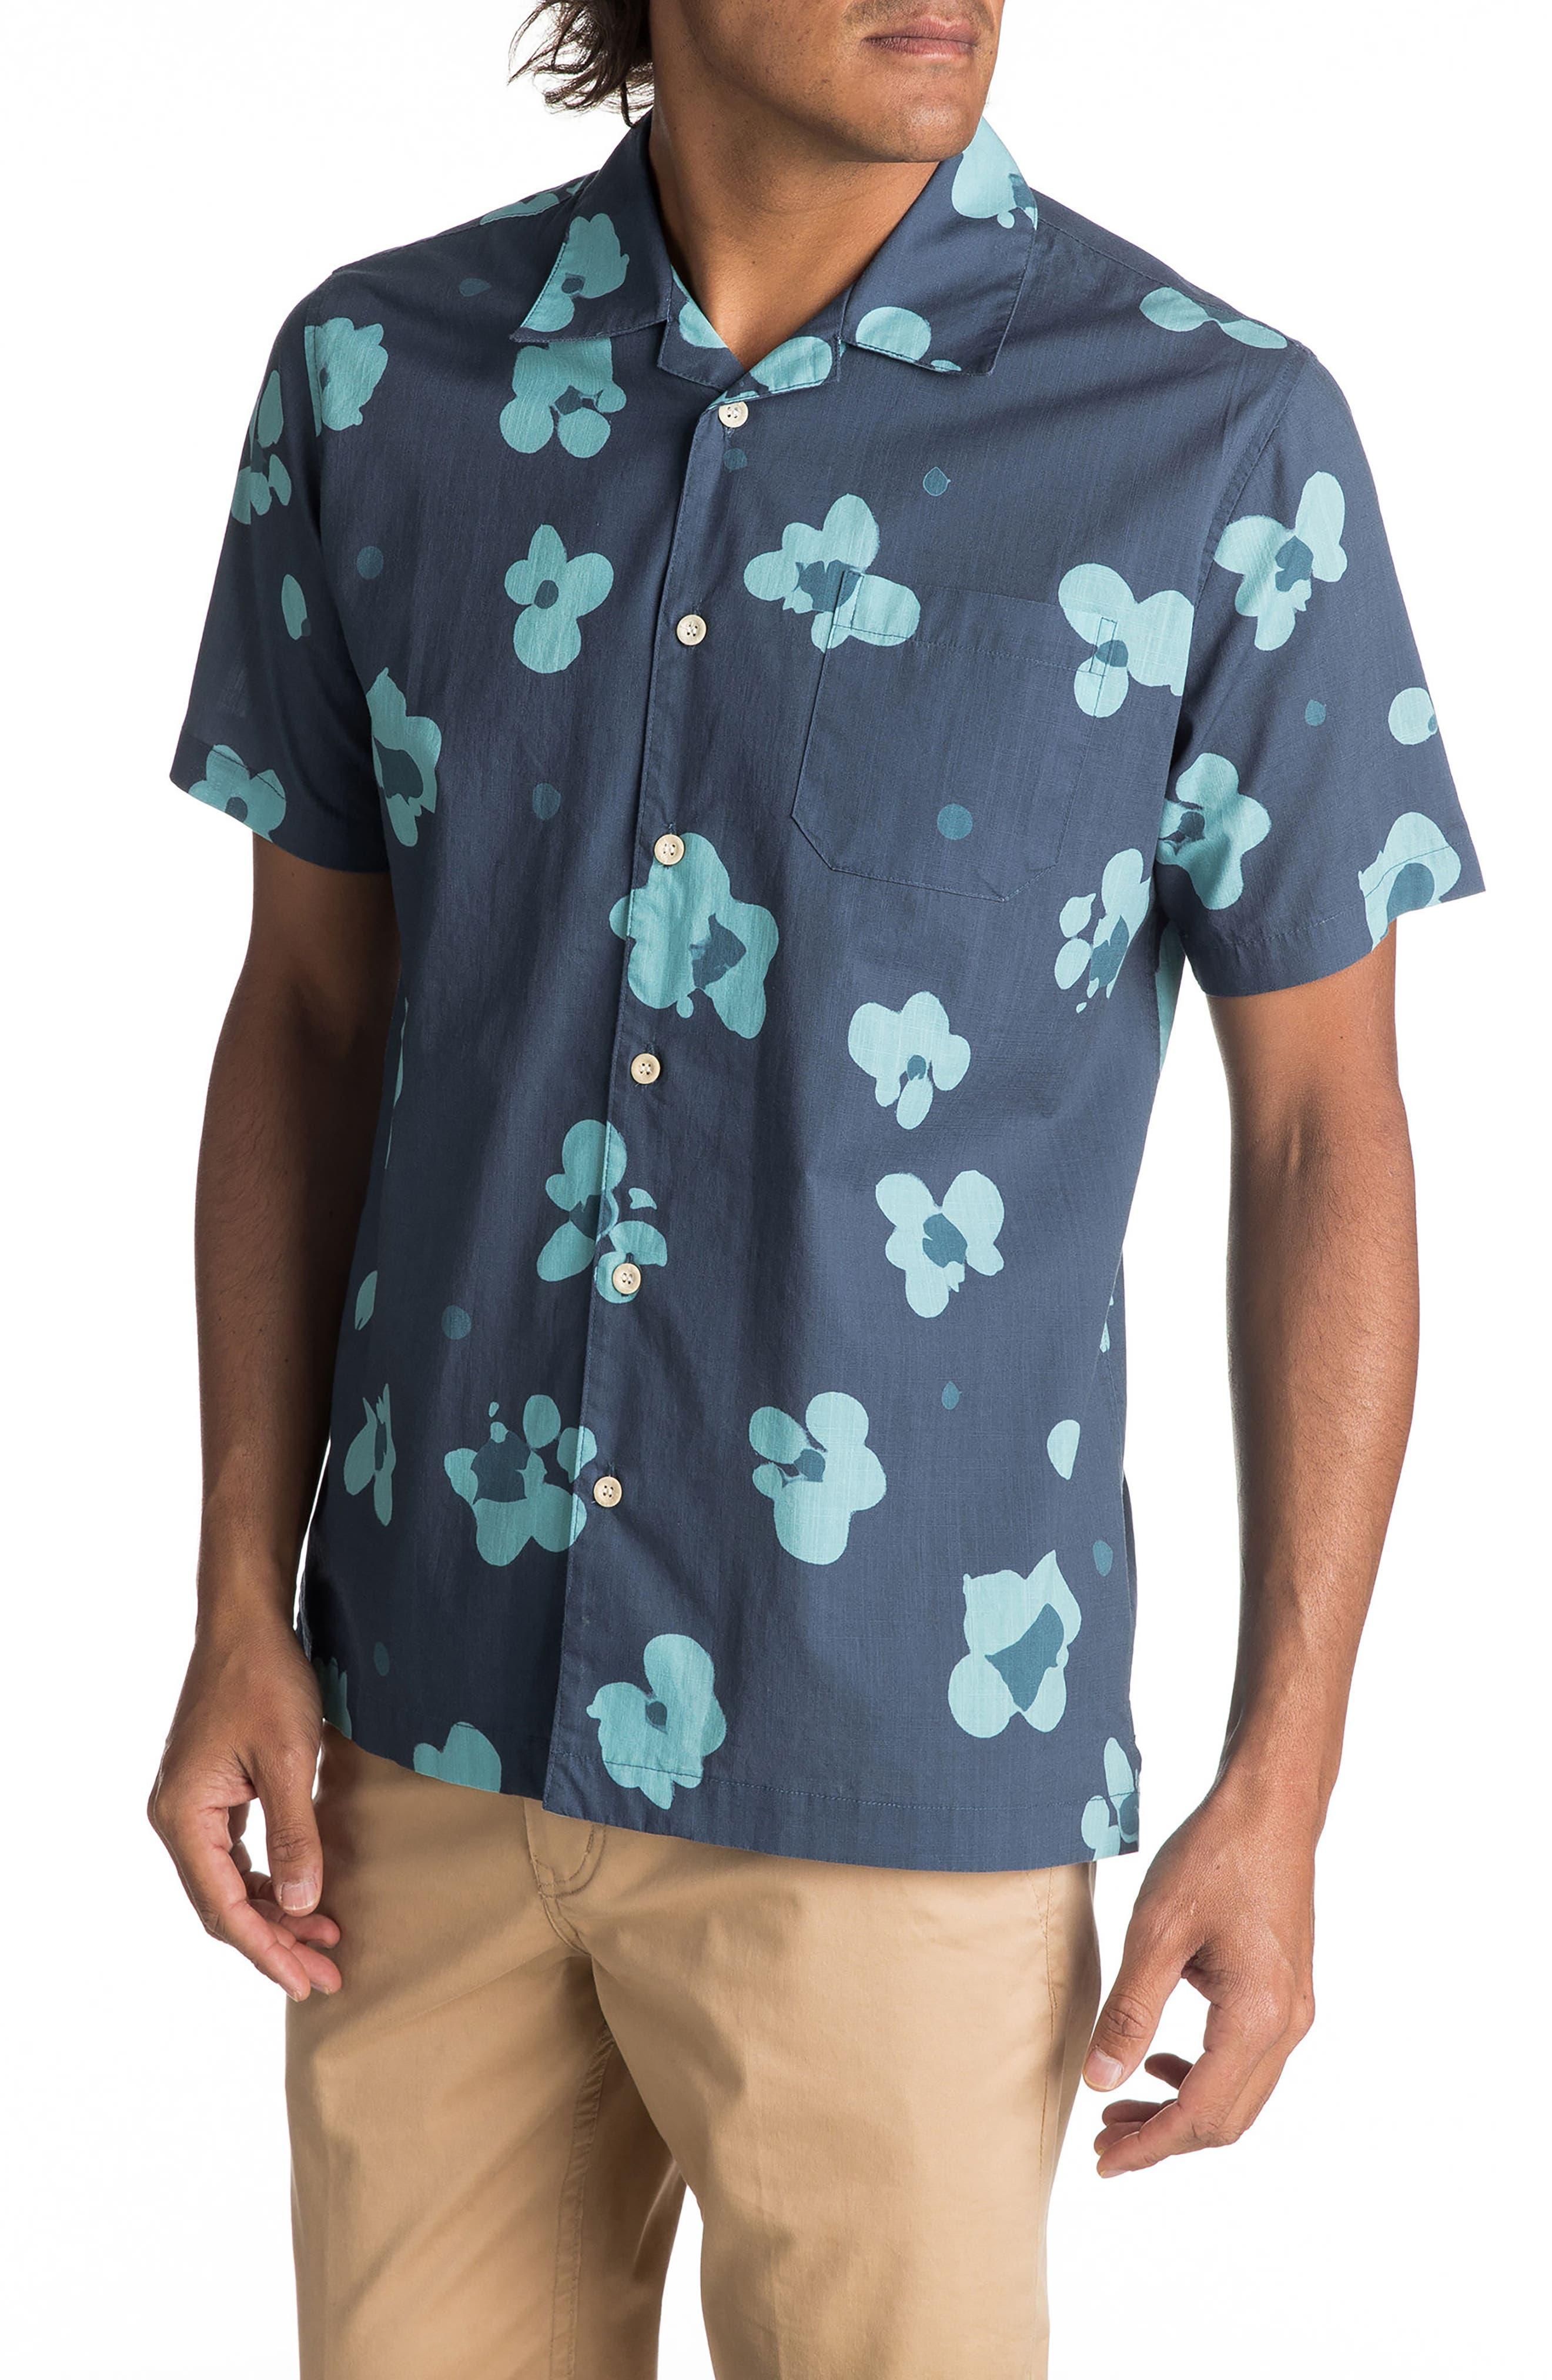 Waterfloral Camp Shirt,                         Main,                         color, 430